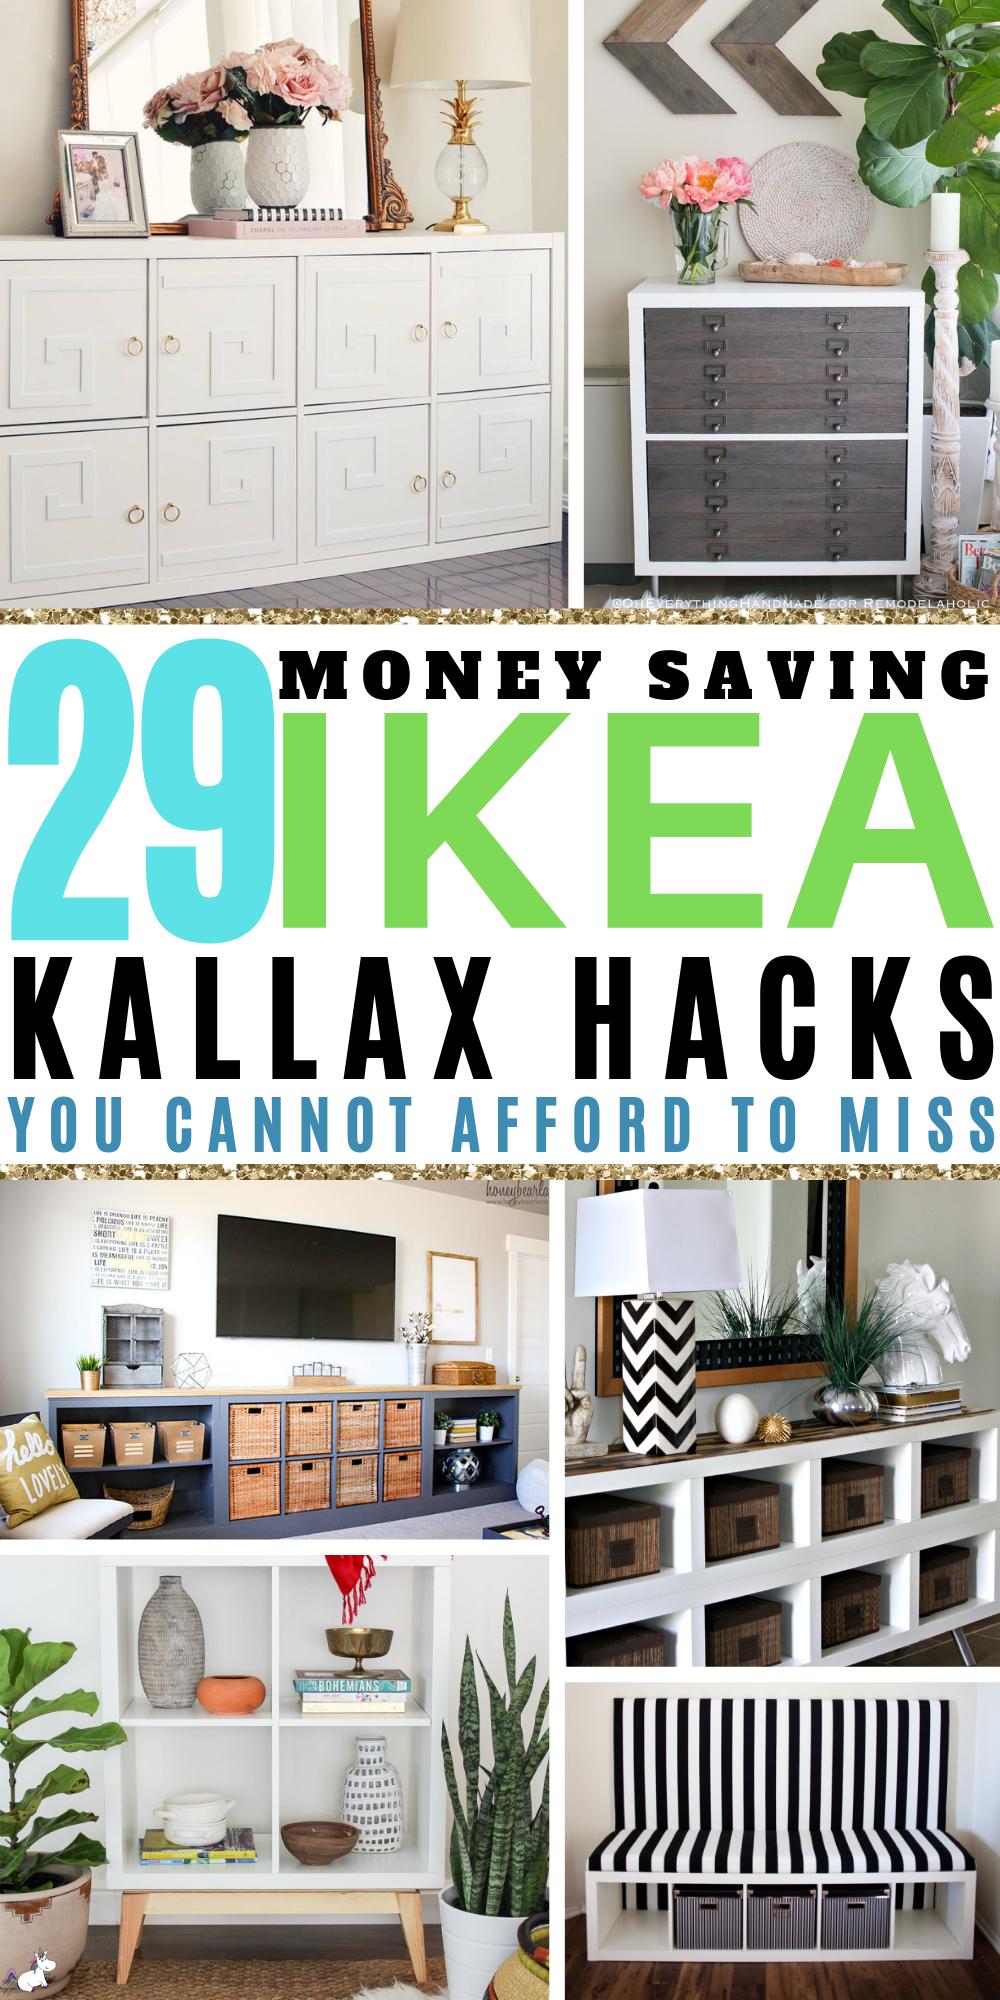 29 Money Saving Ikea Kallax Hacks |for Your Bedroom, Bathroom, Kitchen, Enntryway & More! #ikeakallaxhacks #ikeahacks #bestikeahacks #homedecoronabudget